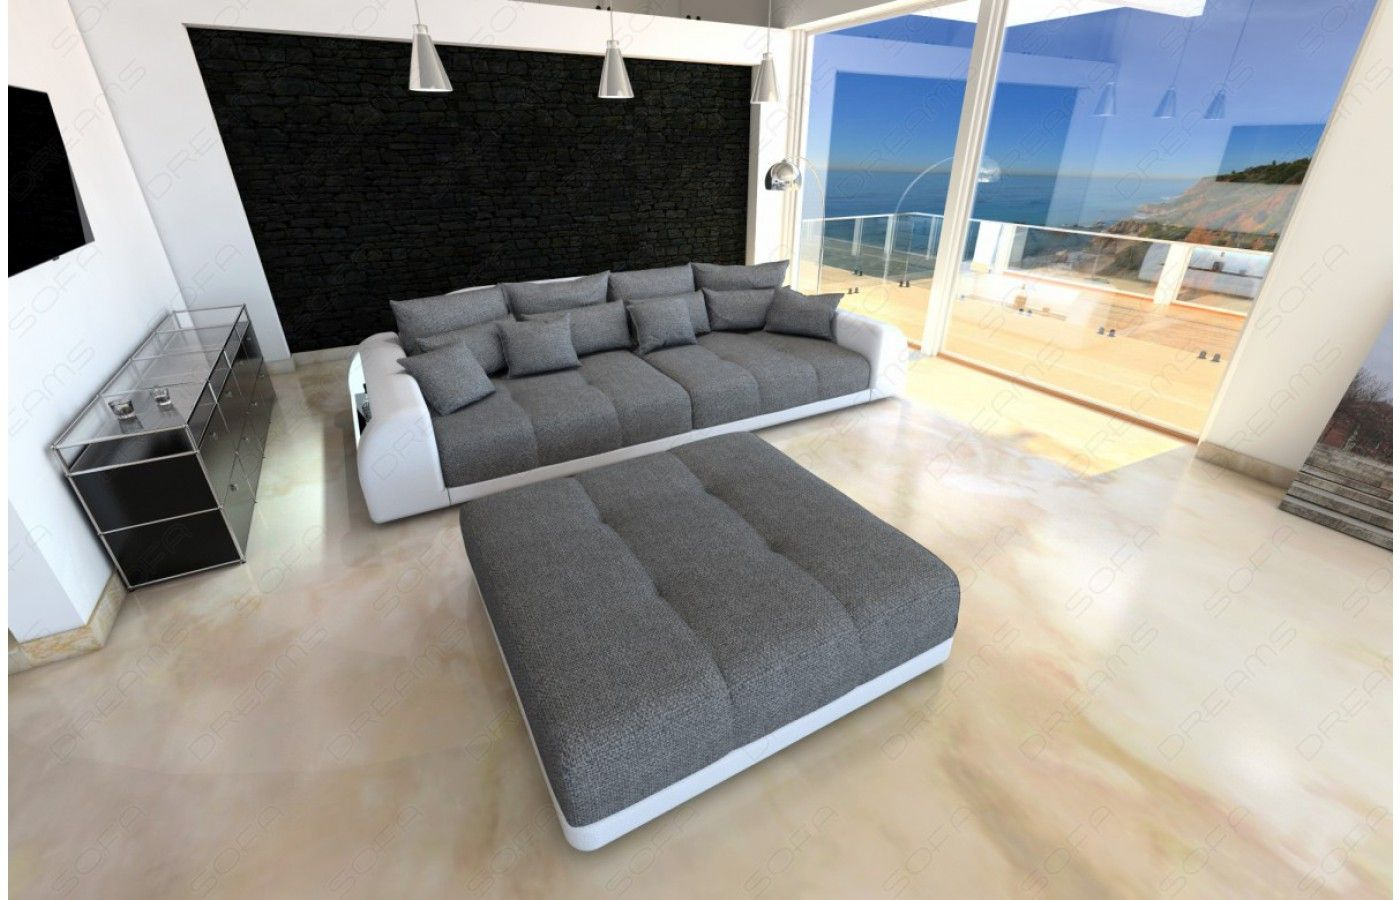 Cool  Design BigSofa mit LED Beleuchtung Exklusiv bei Sofa Dreams Big Sofa MIAMI Pinterest LED Sofas and Dreams